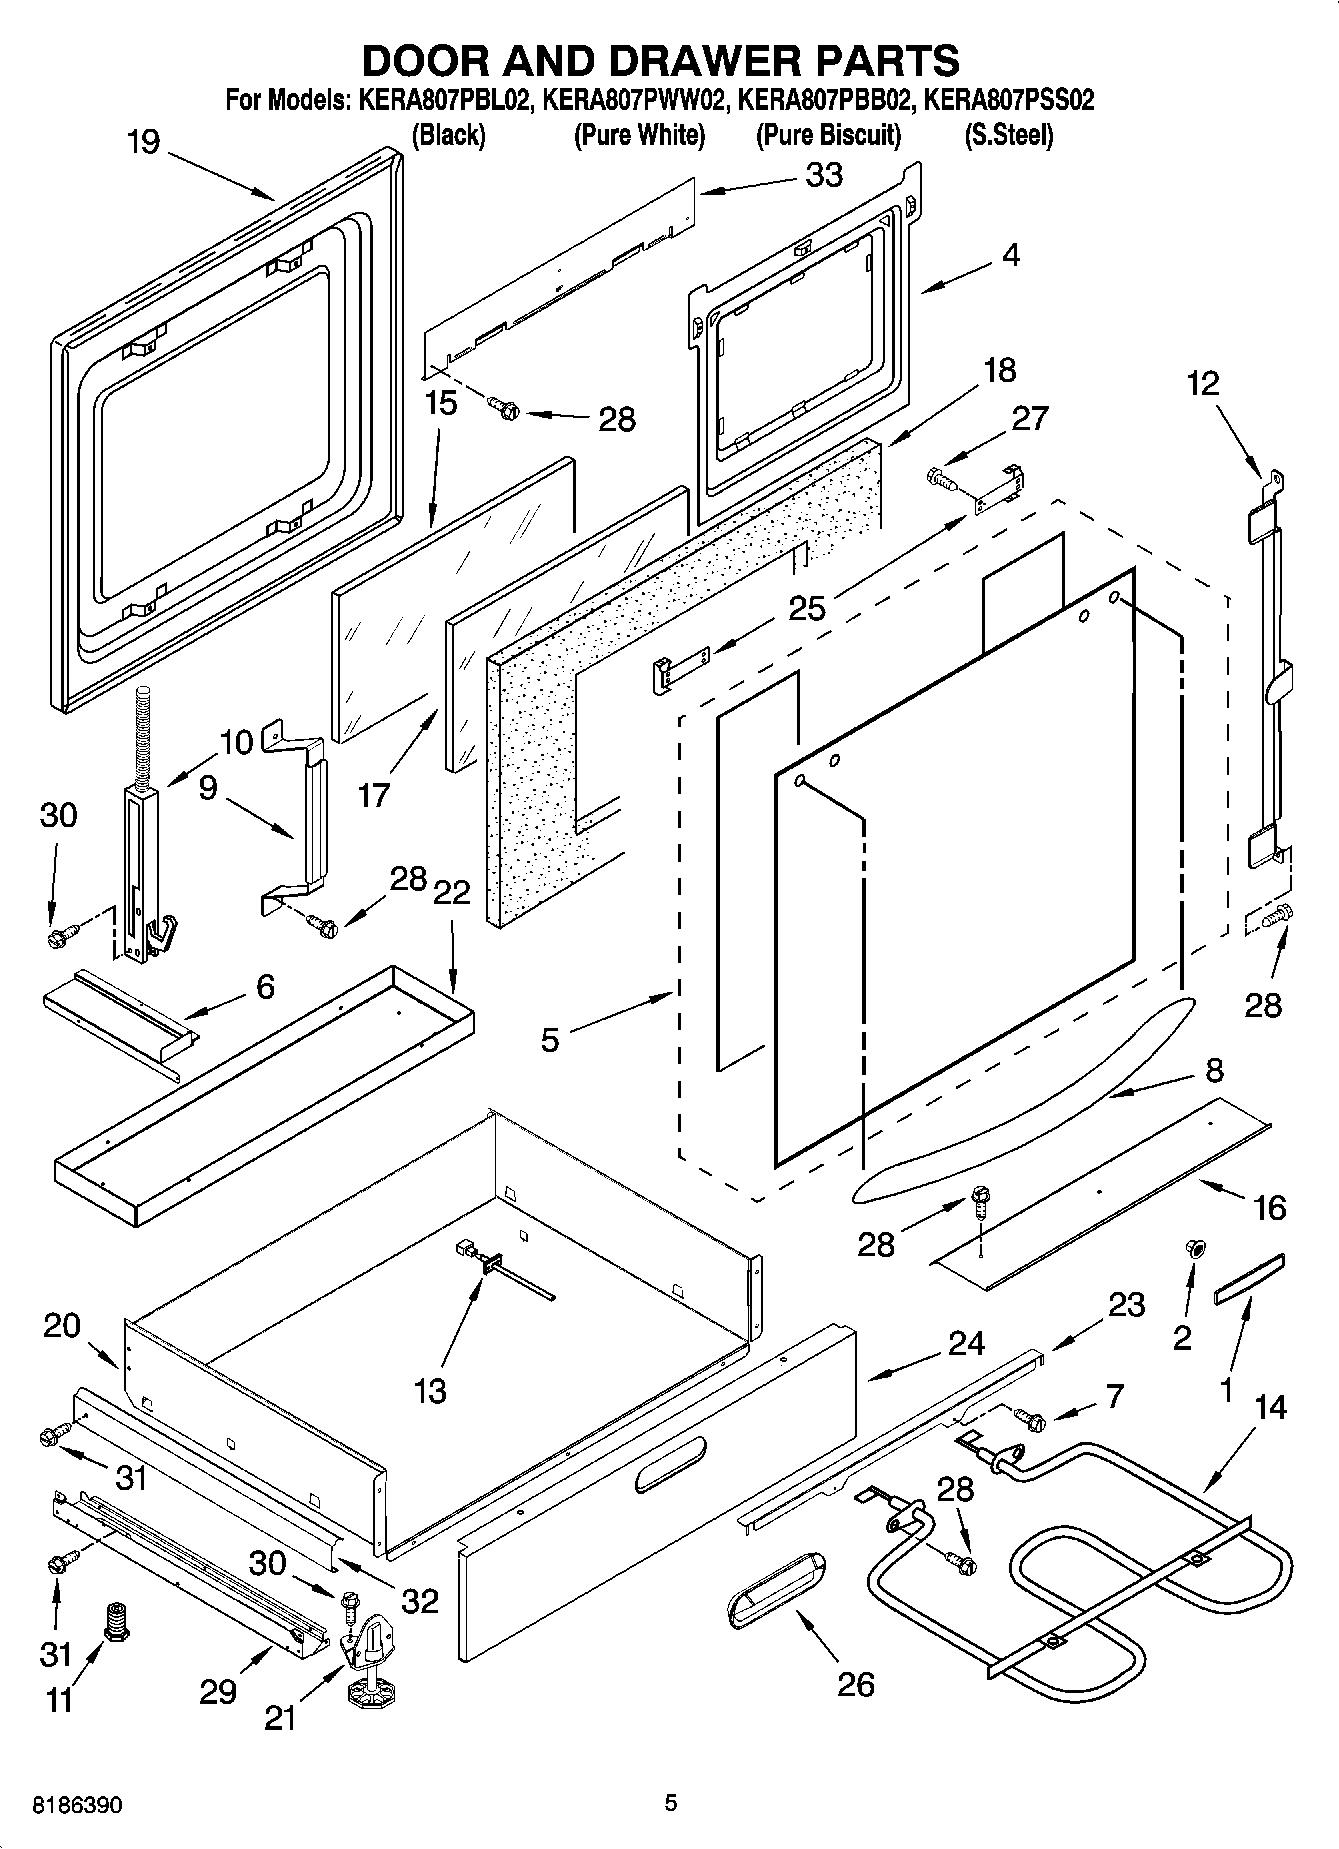 KERA807PWW02